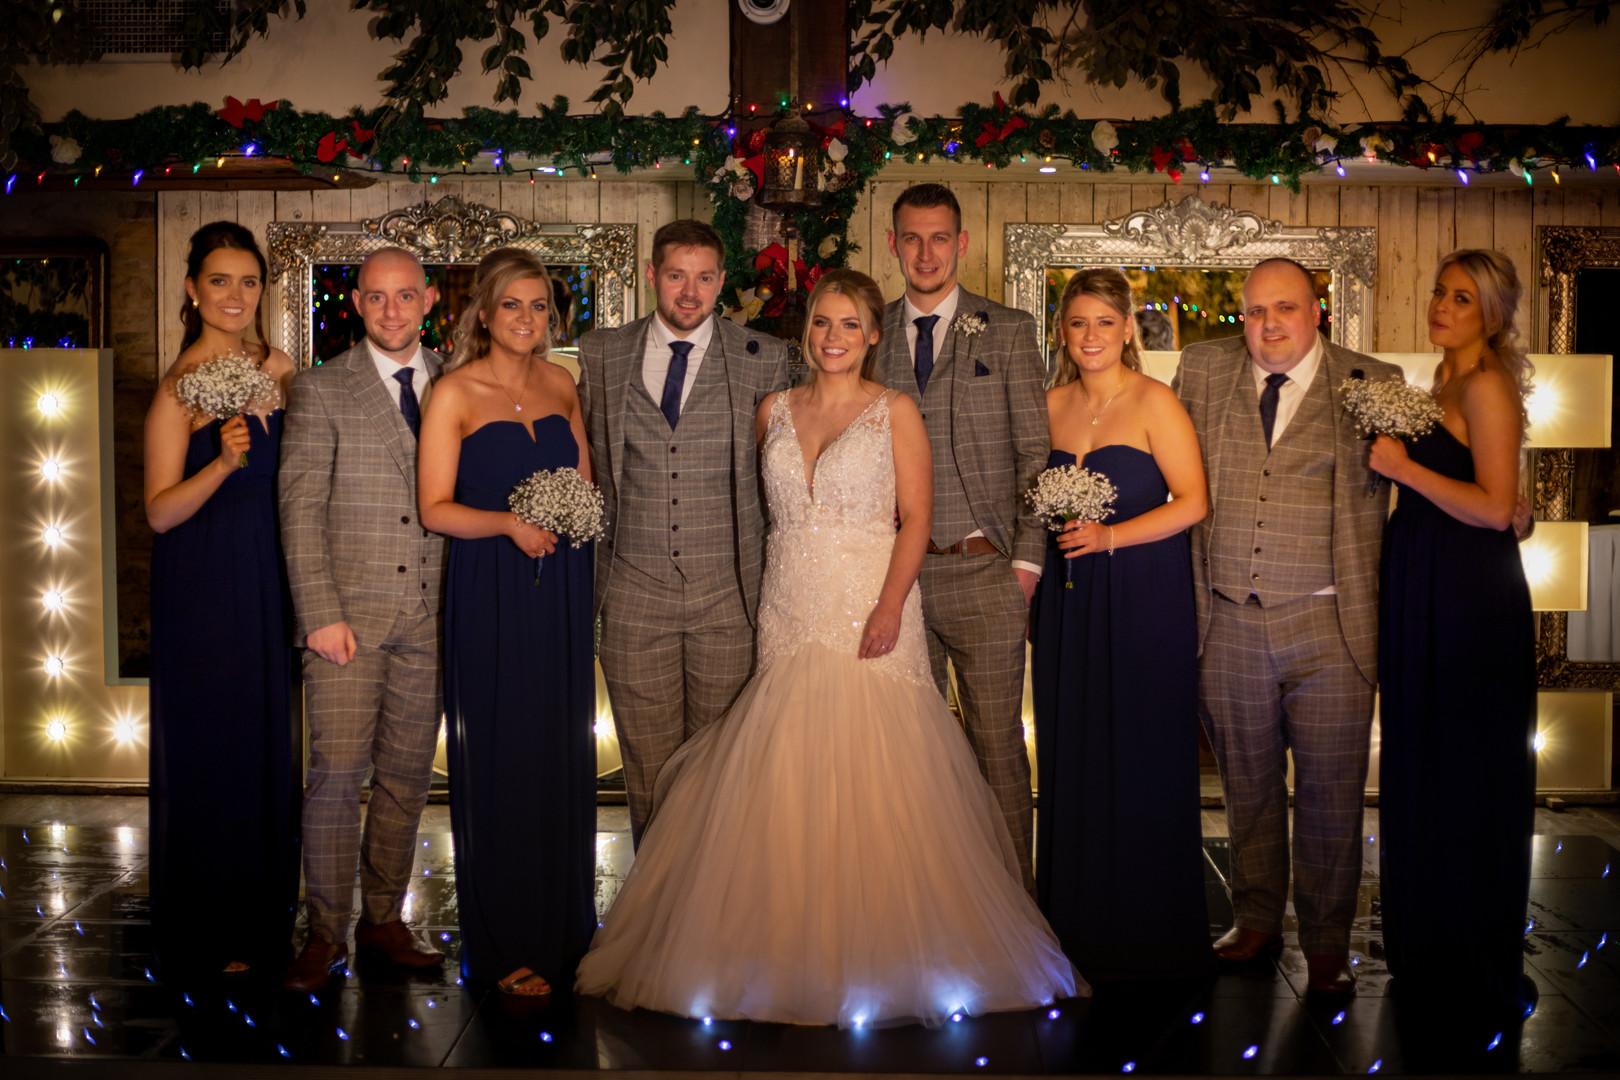 Damien And Gemma - Bestmen And Bridesmaids